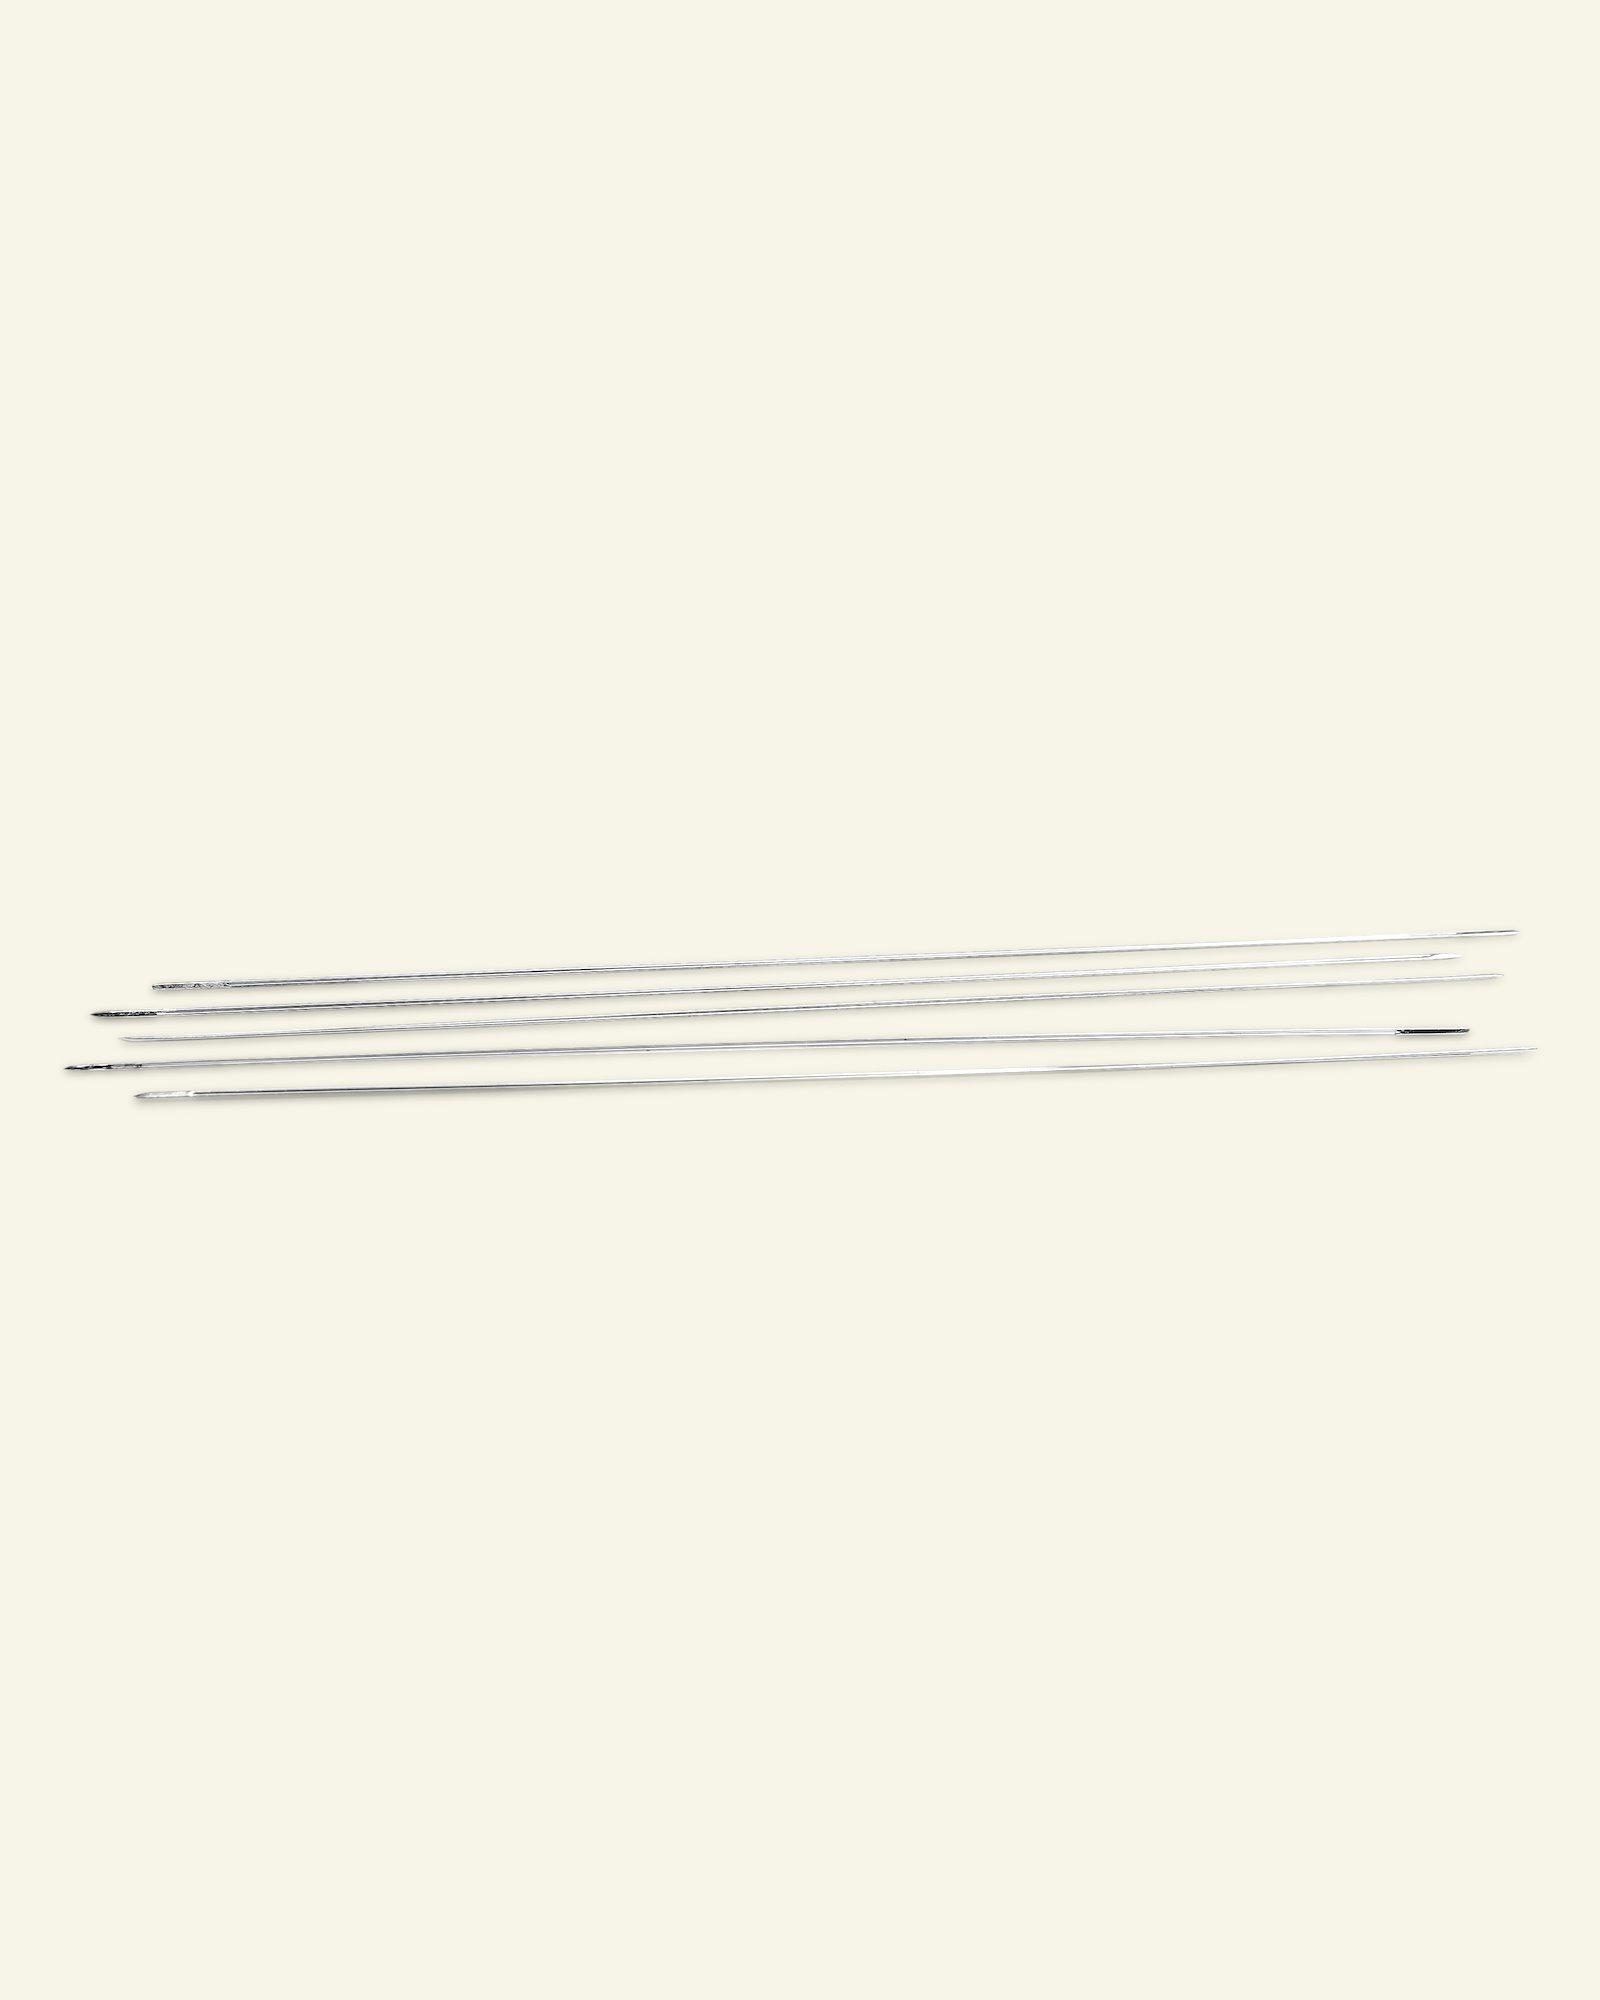 Beading needle / split needle 10cm 5pcs